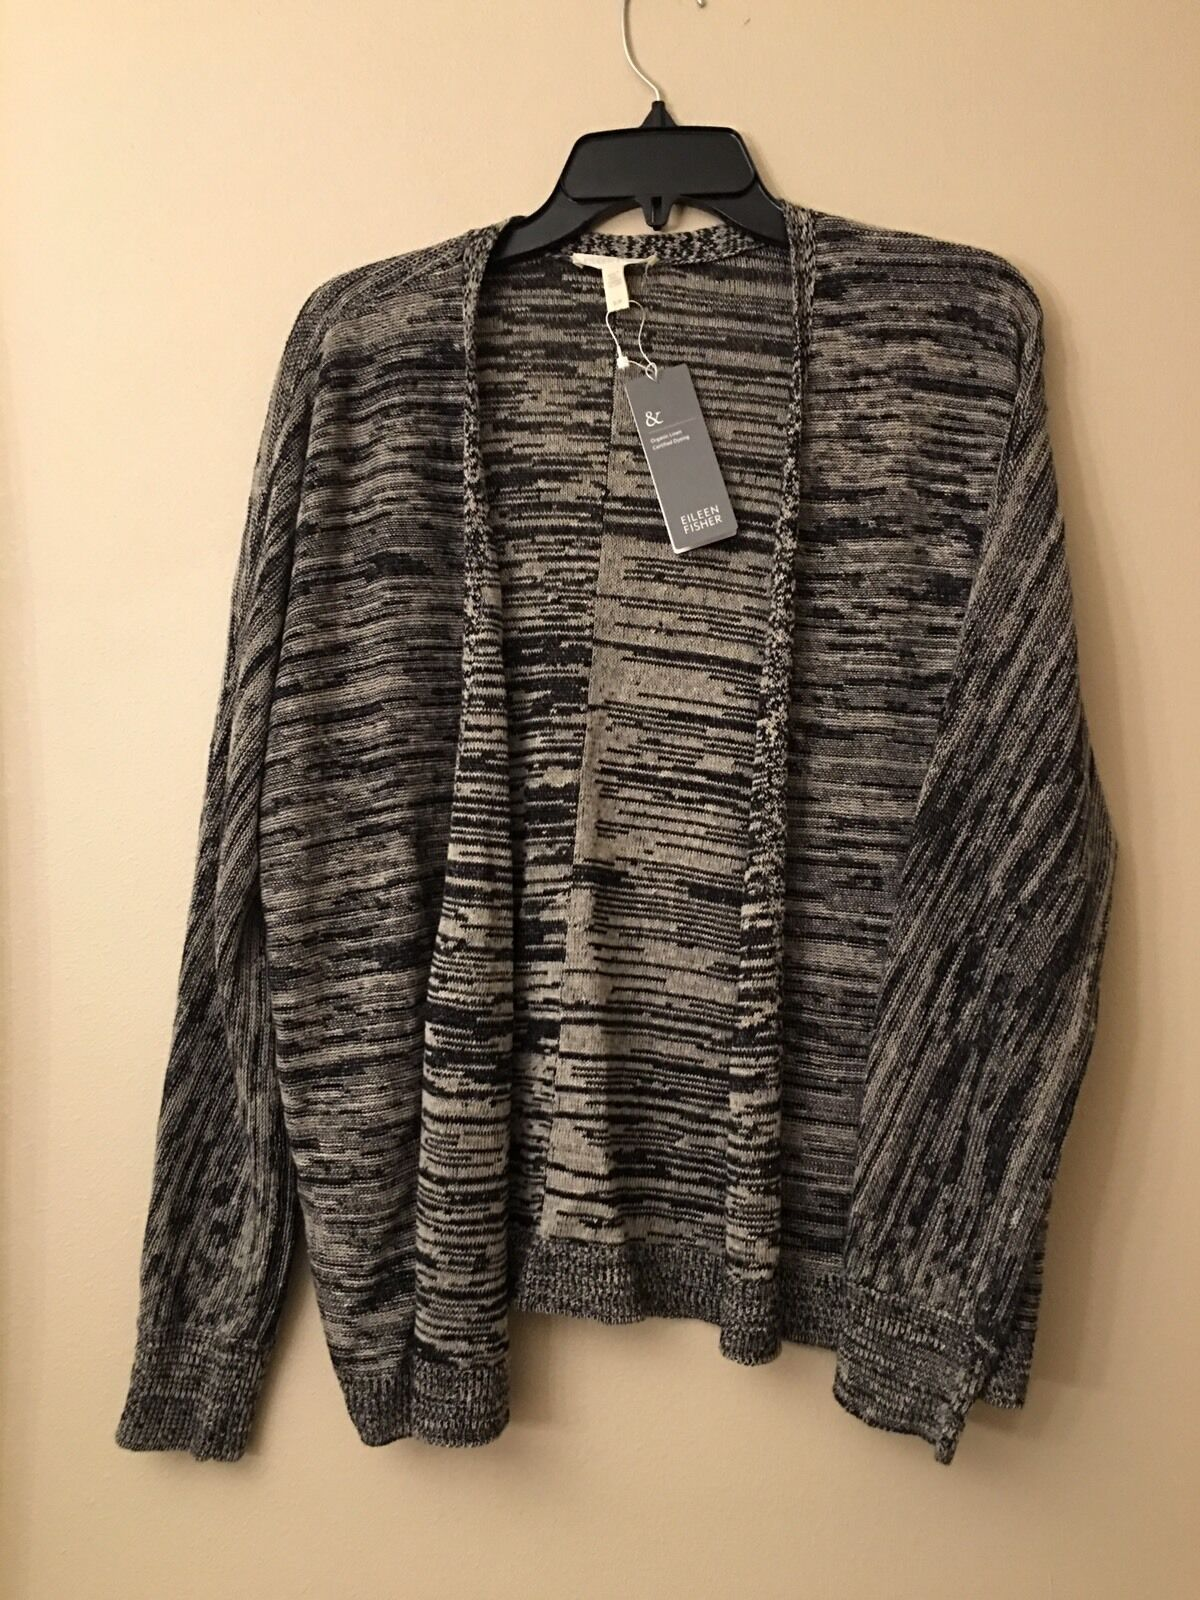 NWT EILEEN FISHER Organic Linen Sweater Cardigans Sz S